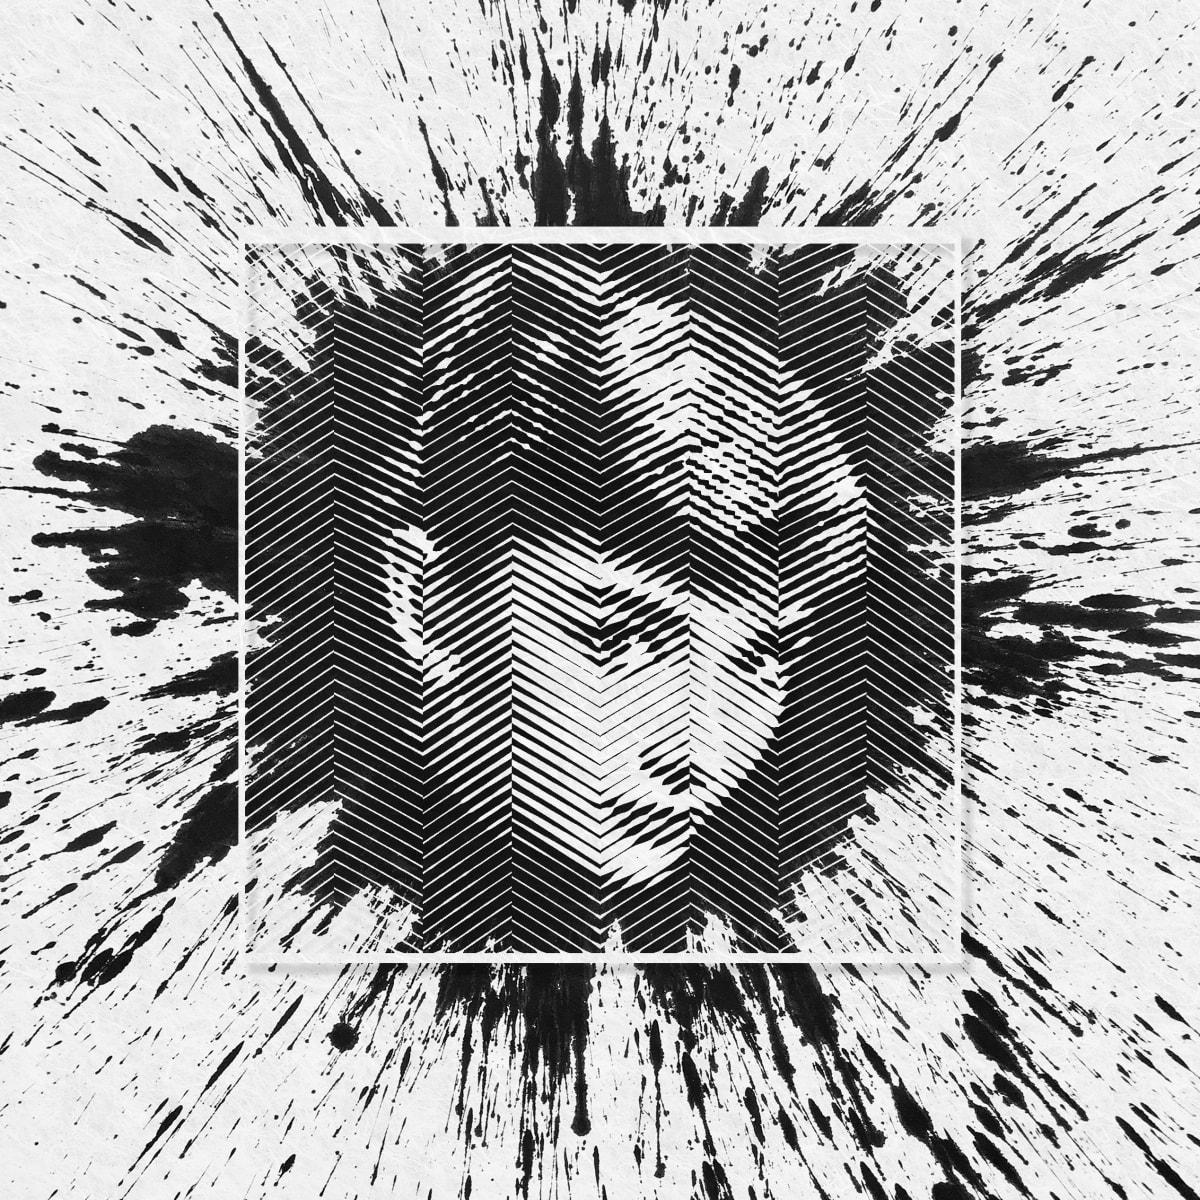 Yoo Hyun, Untitled (Audrey Hepburn), 2019